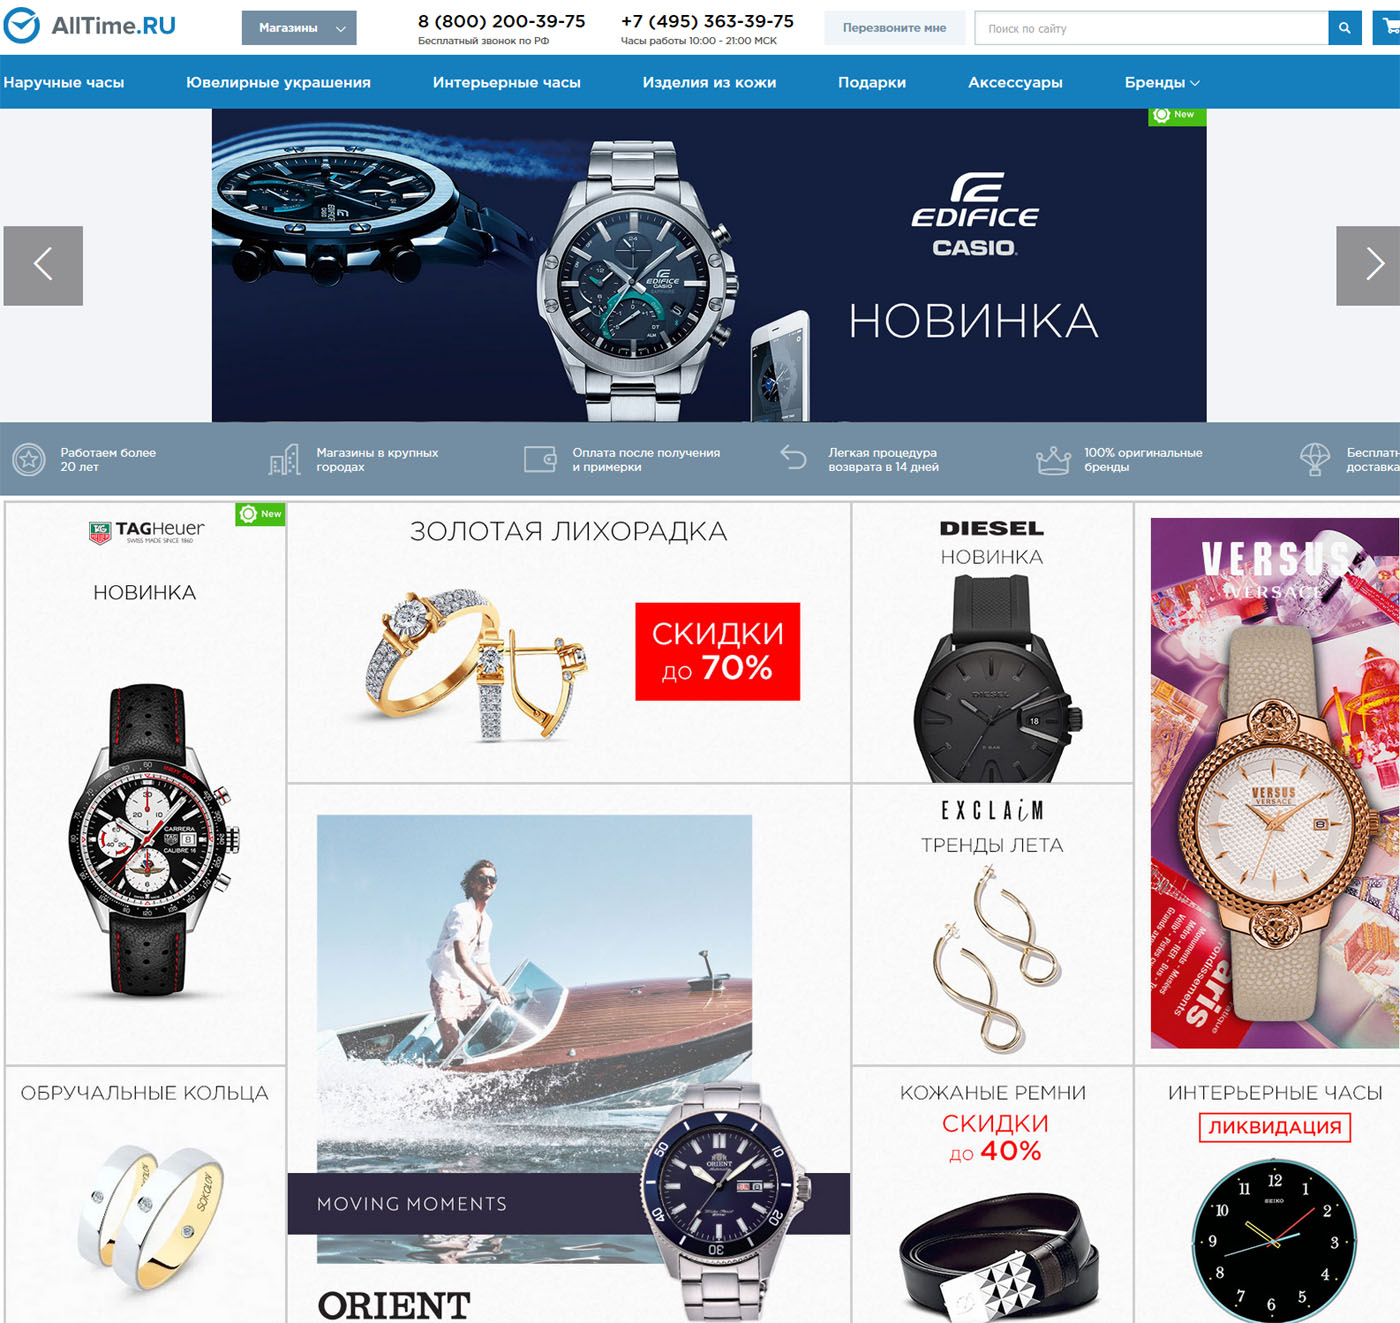 Интернет-магазин Олтайм Ру